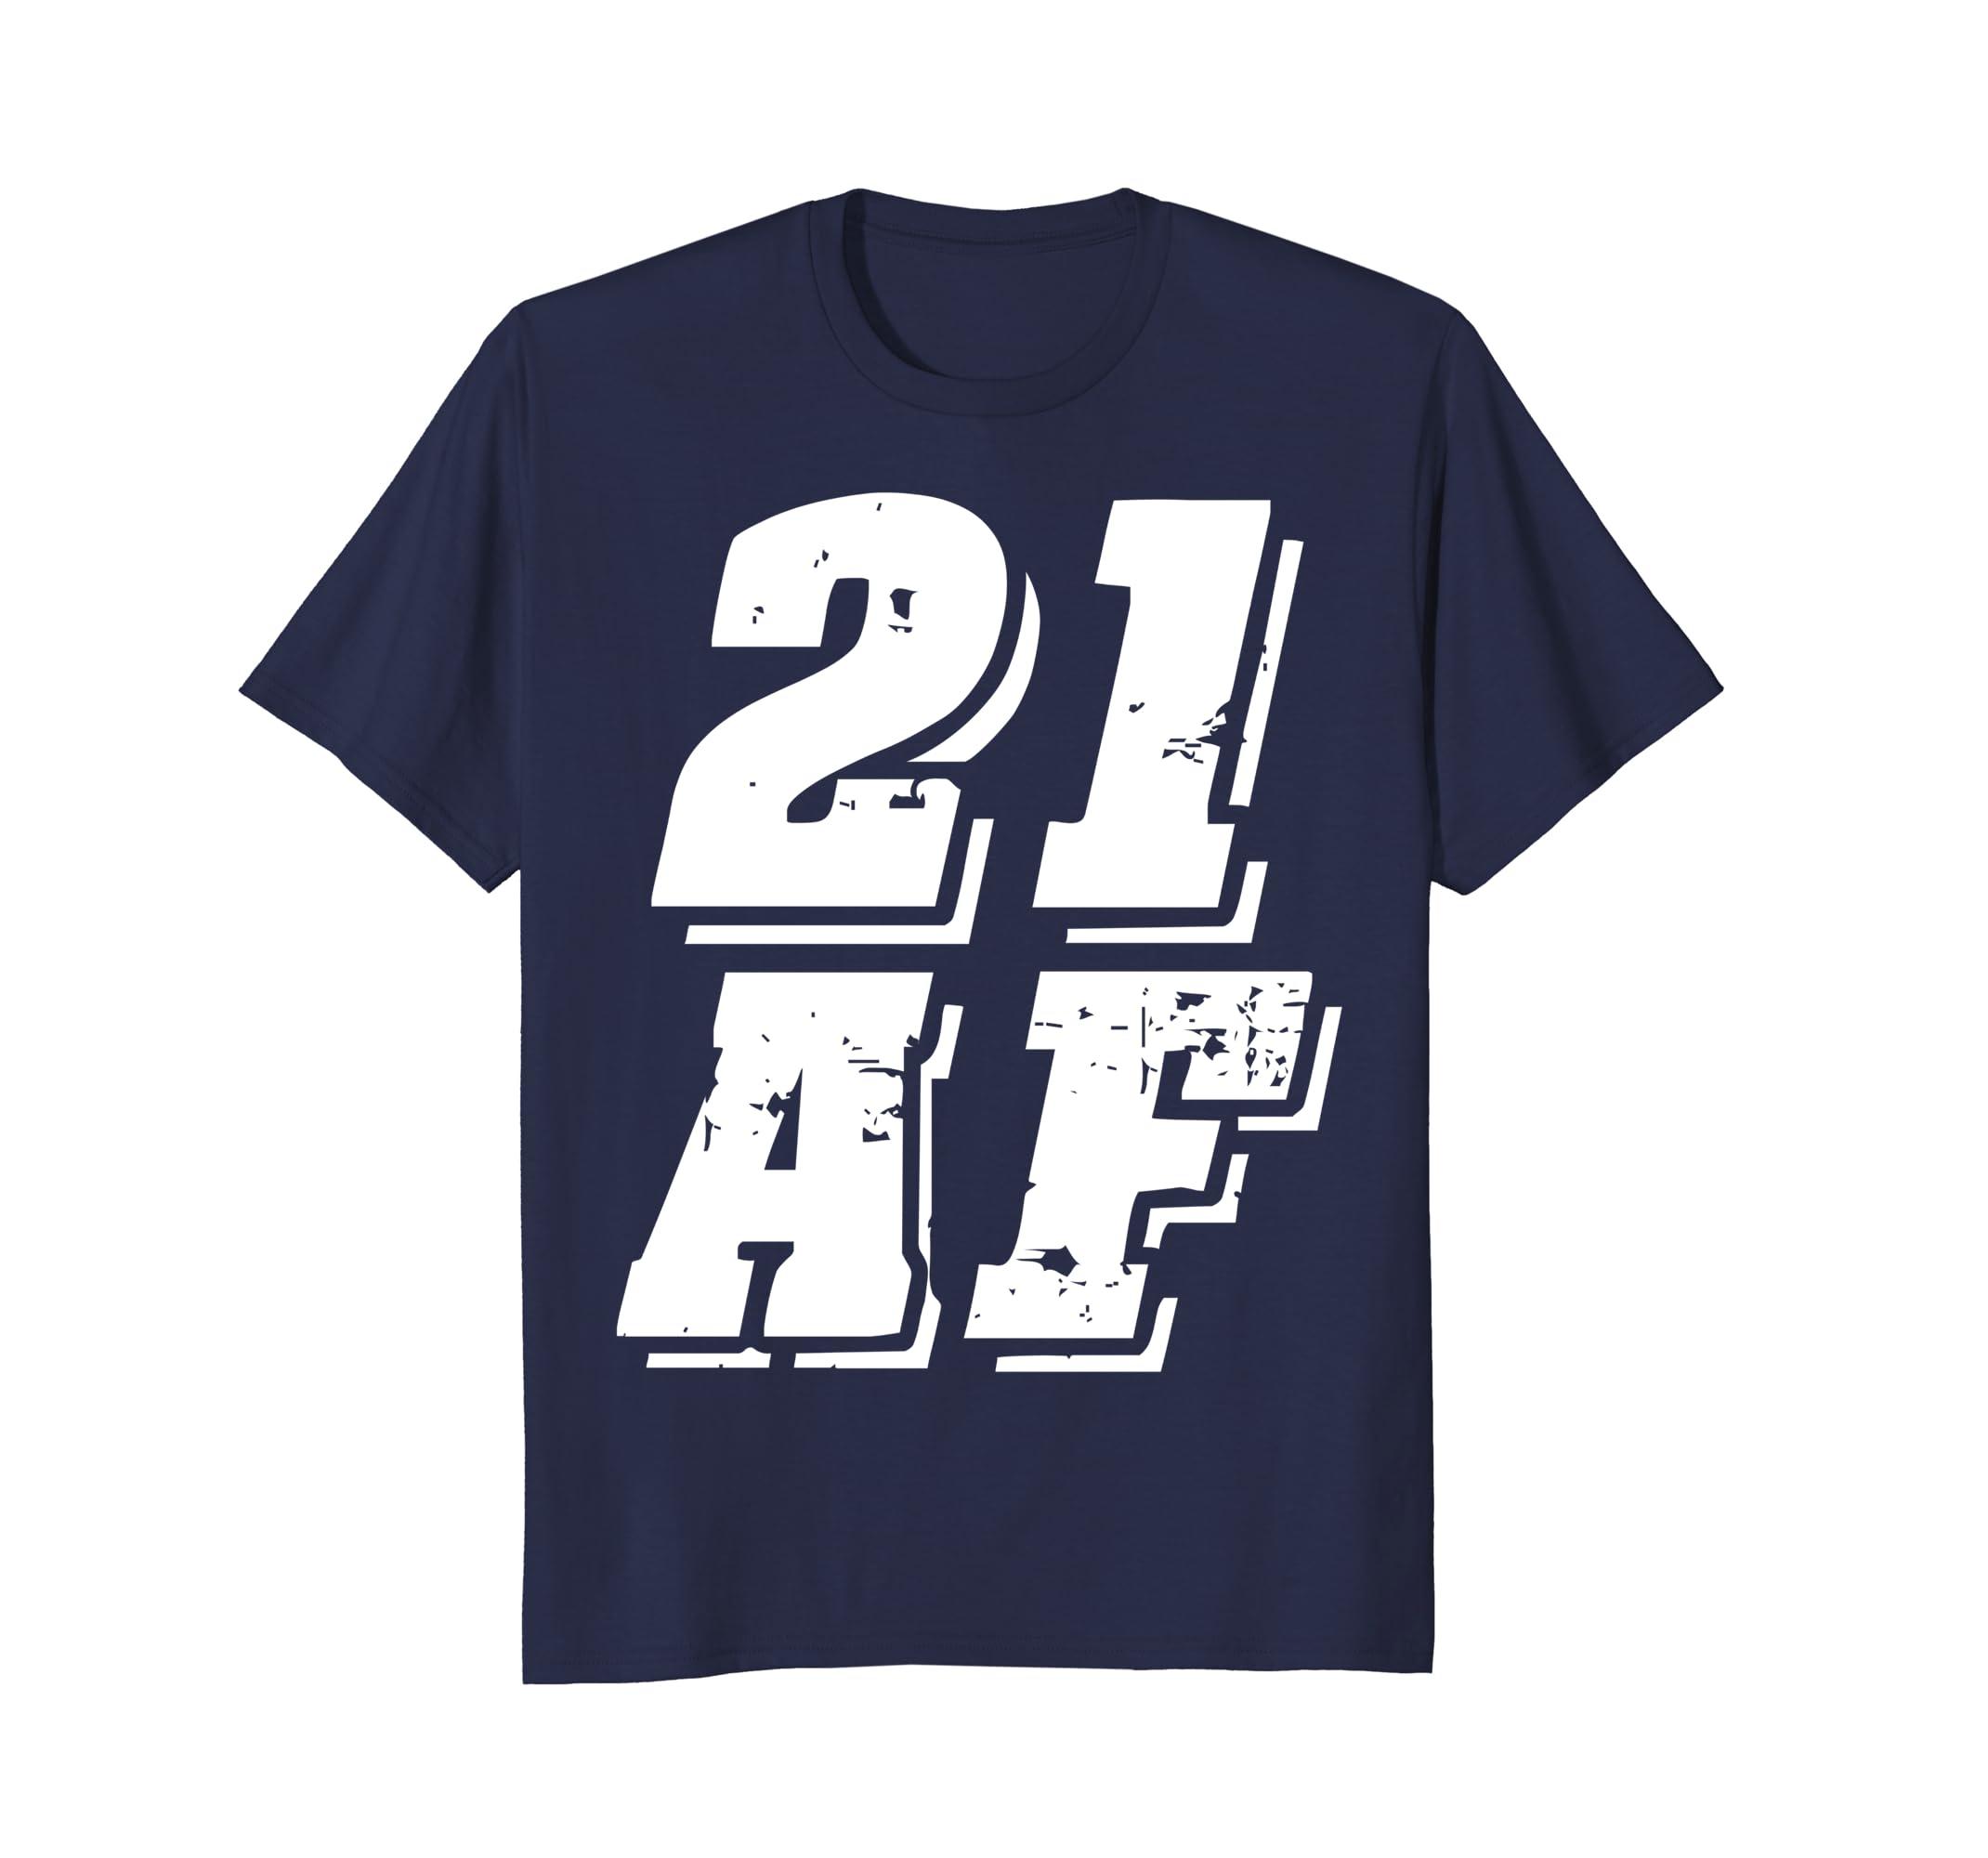 21 AF T-Shirt Funny 21st Birthday Gift Idea Tee Shirt-alottee gift